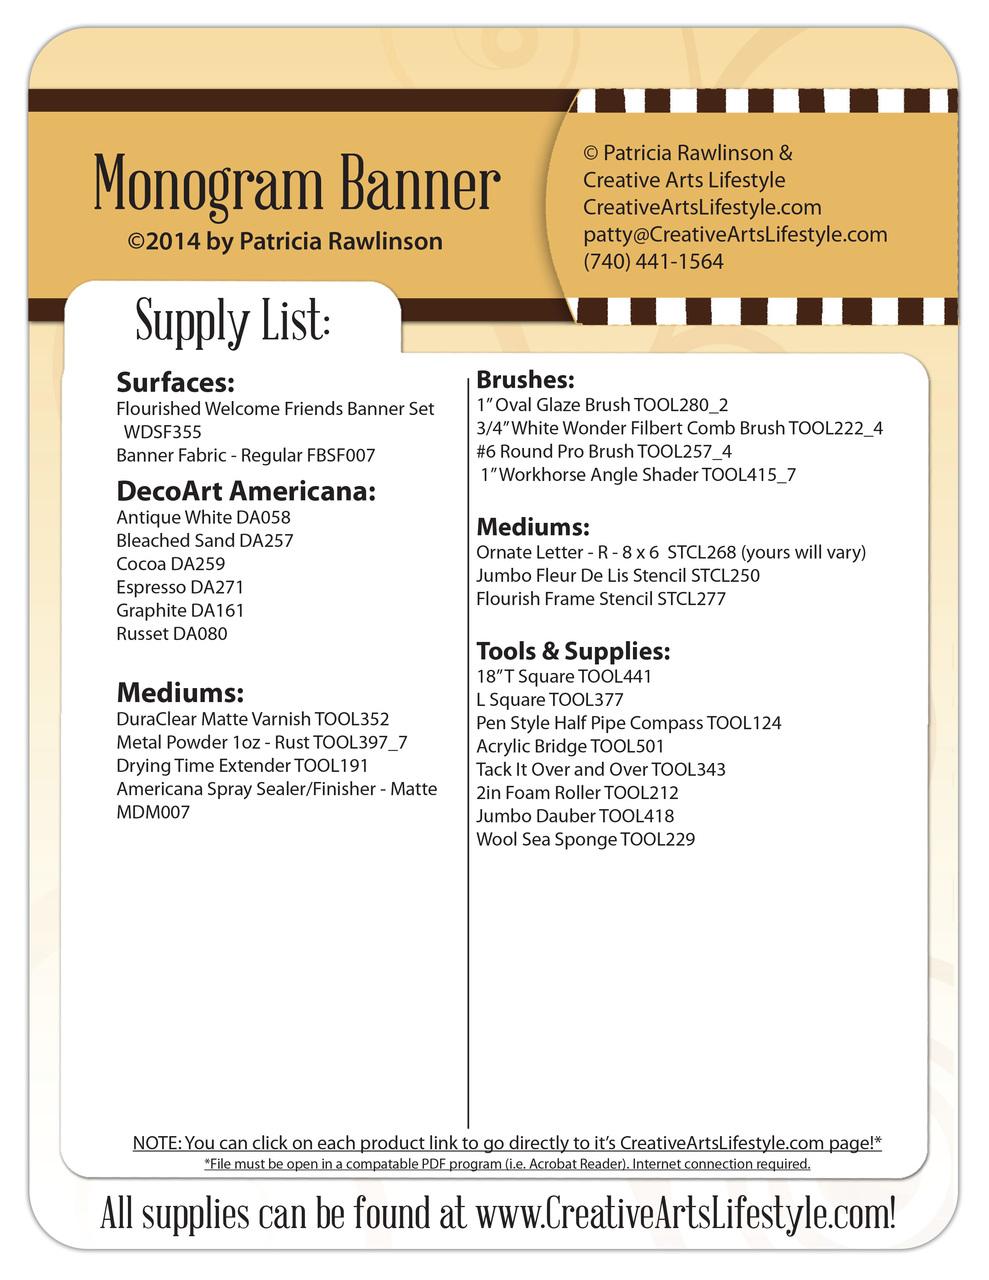 Monogram Banner DVD & Pattern Packet - Patricia Rawlinson